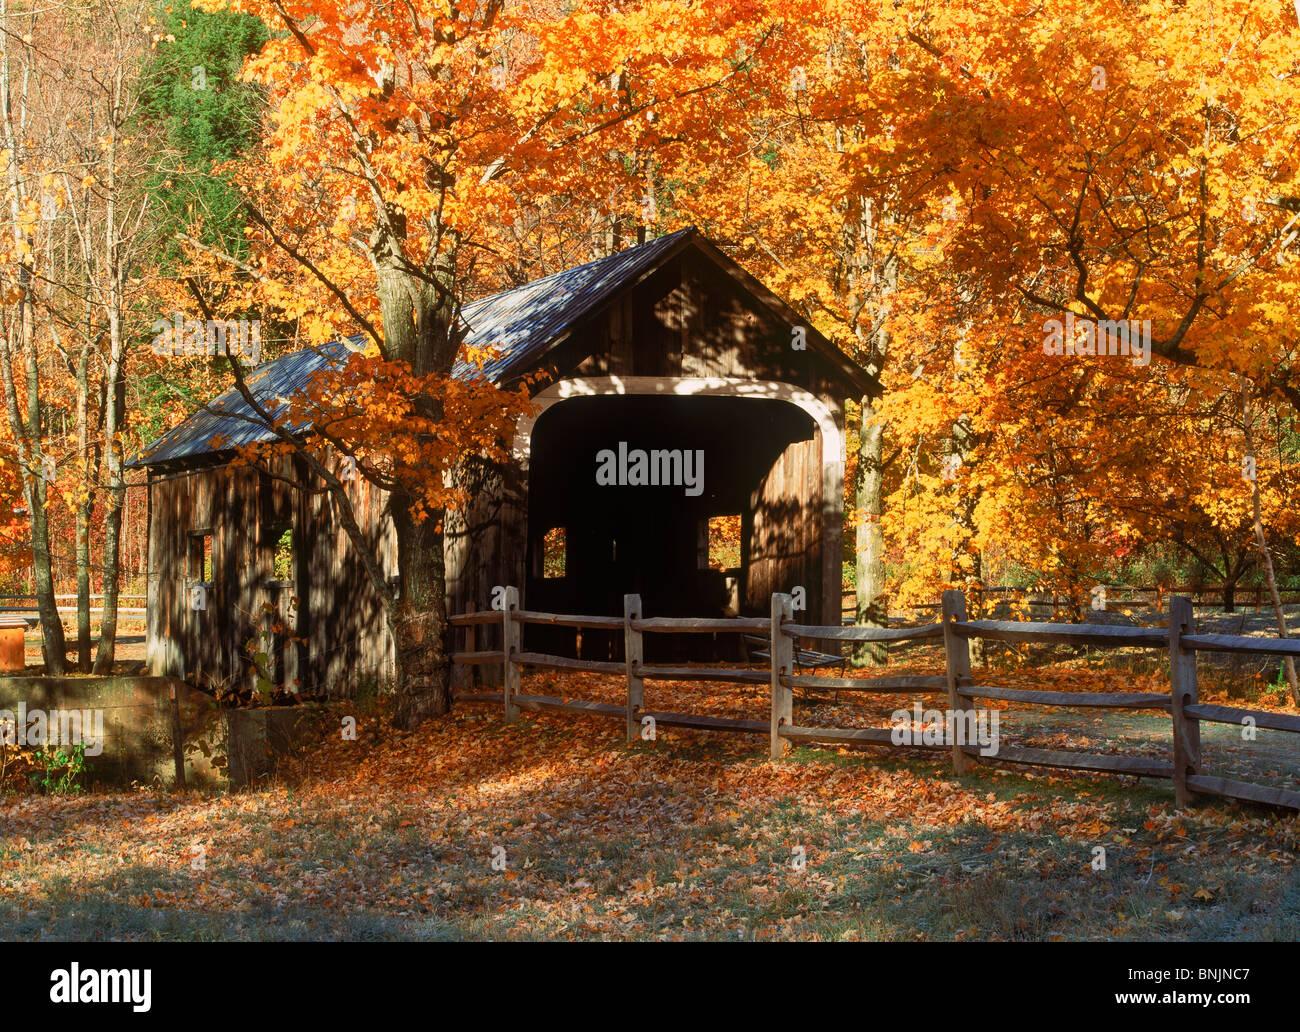 Vermont Fall Foliage Wallpaper Old Covered Bridge Amid Fall Foliage Near Grafton Vermont